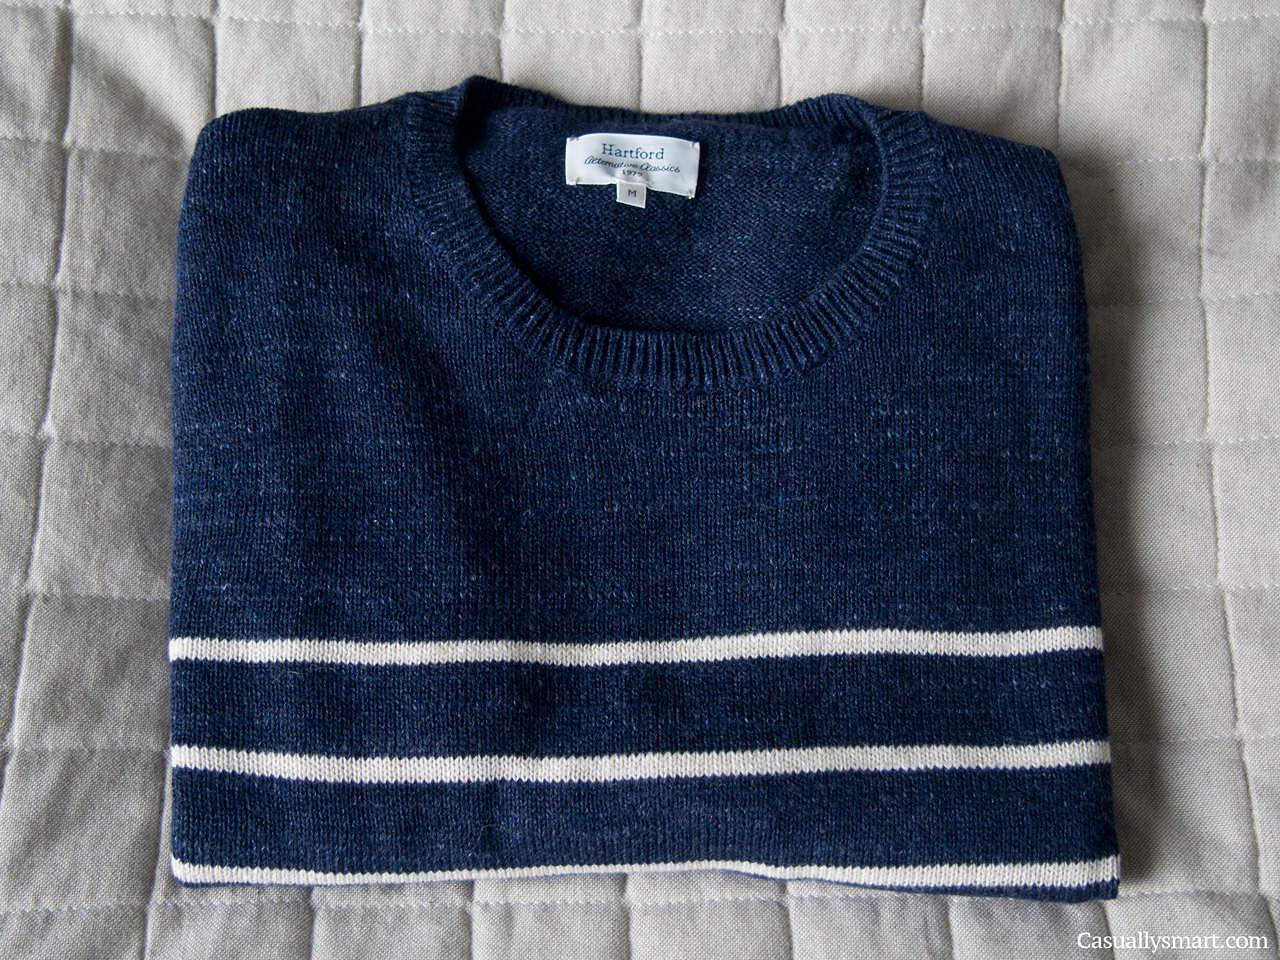 hartford-striped-sweater